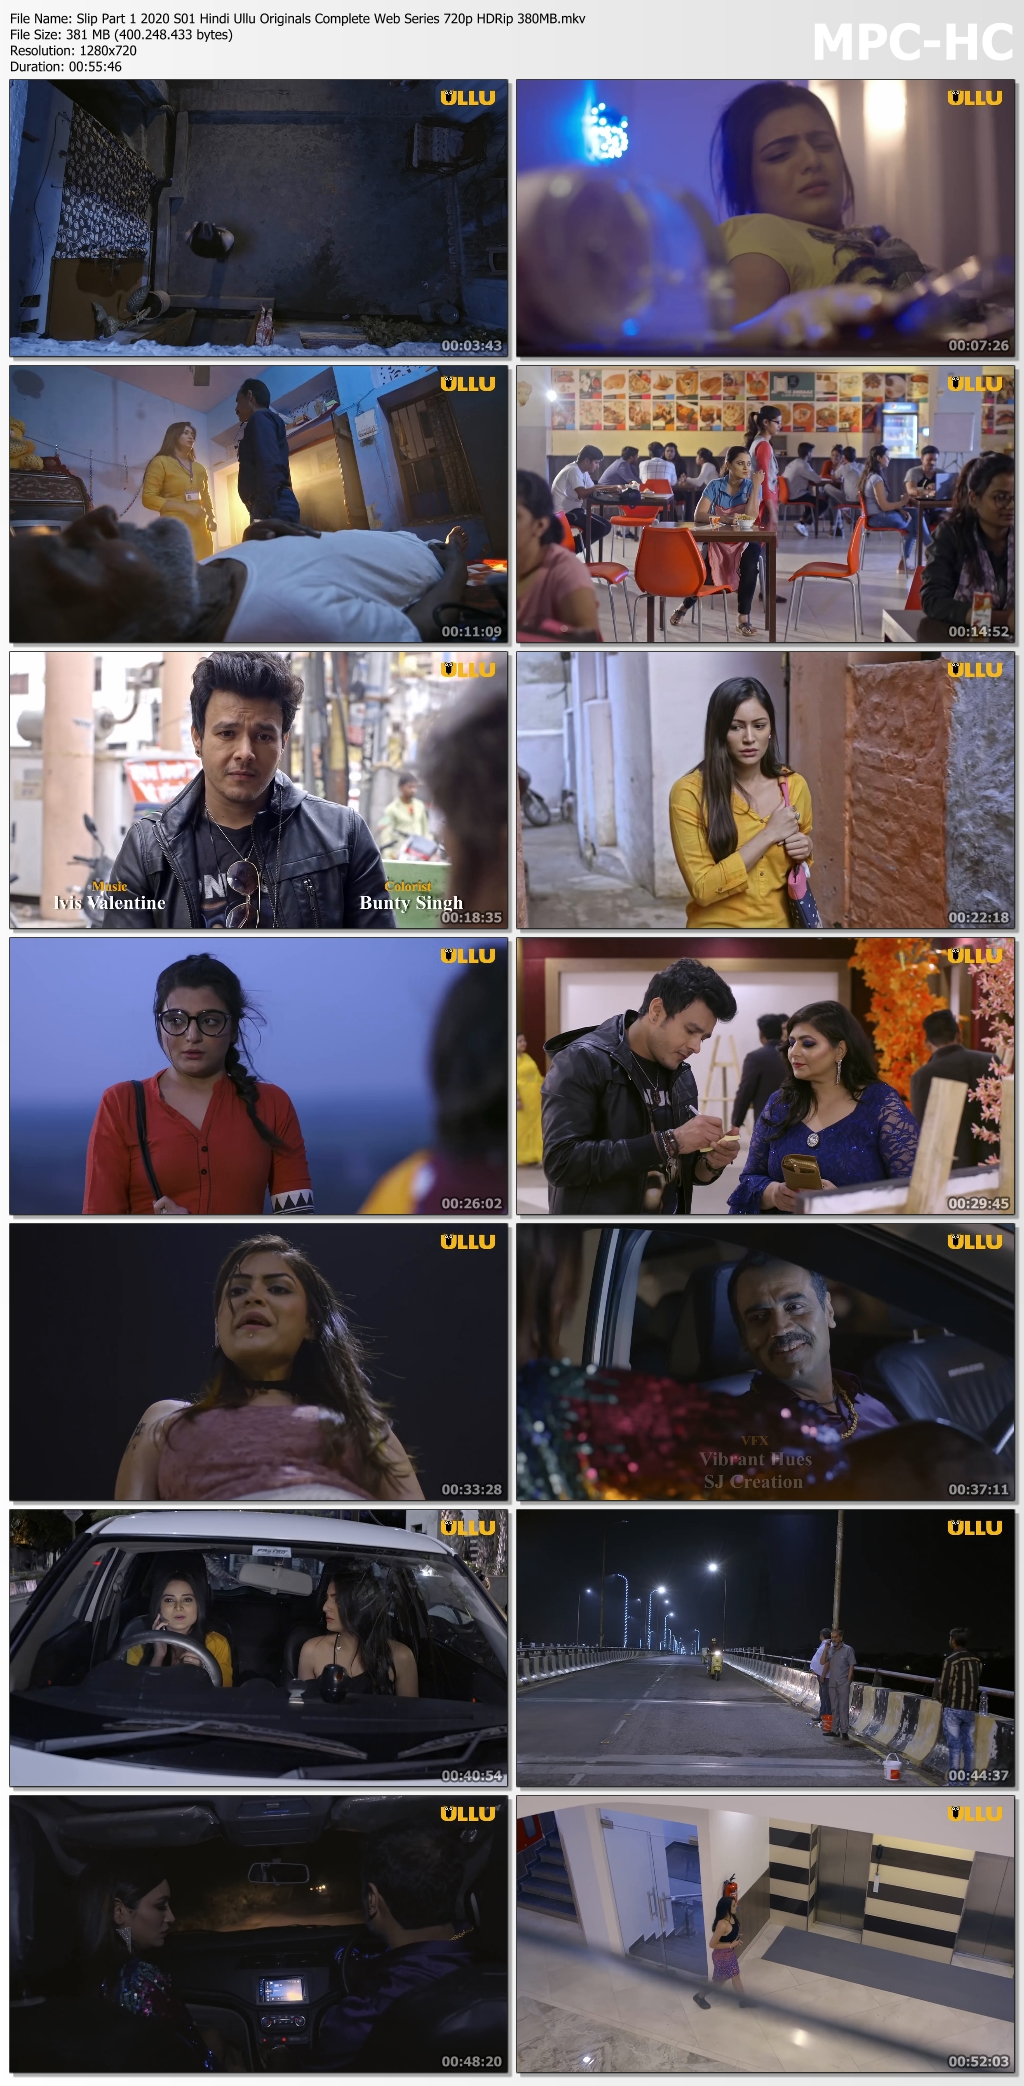 Slip-Part-1-2020-S01-Hindi-Ullu-Originals-Complete-Web-Series-720p-HDRip-380-MB-mkv-thumbs